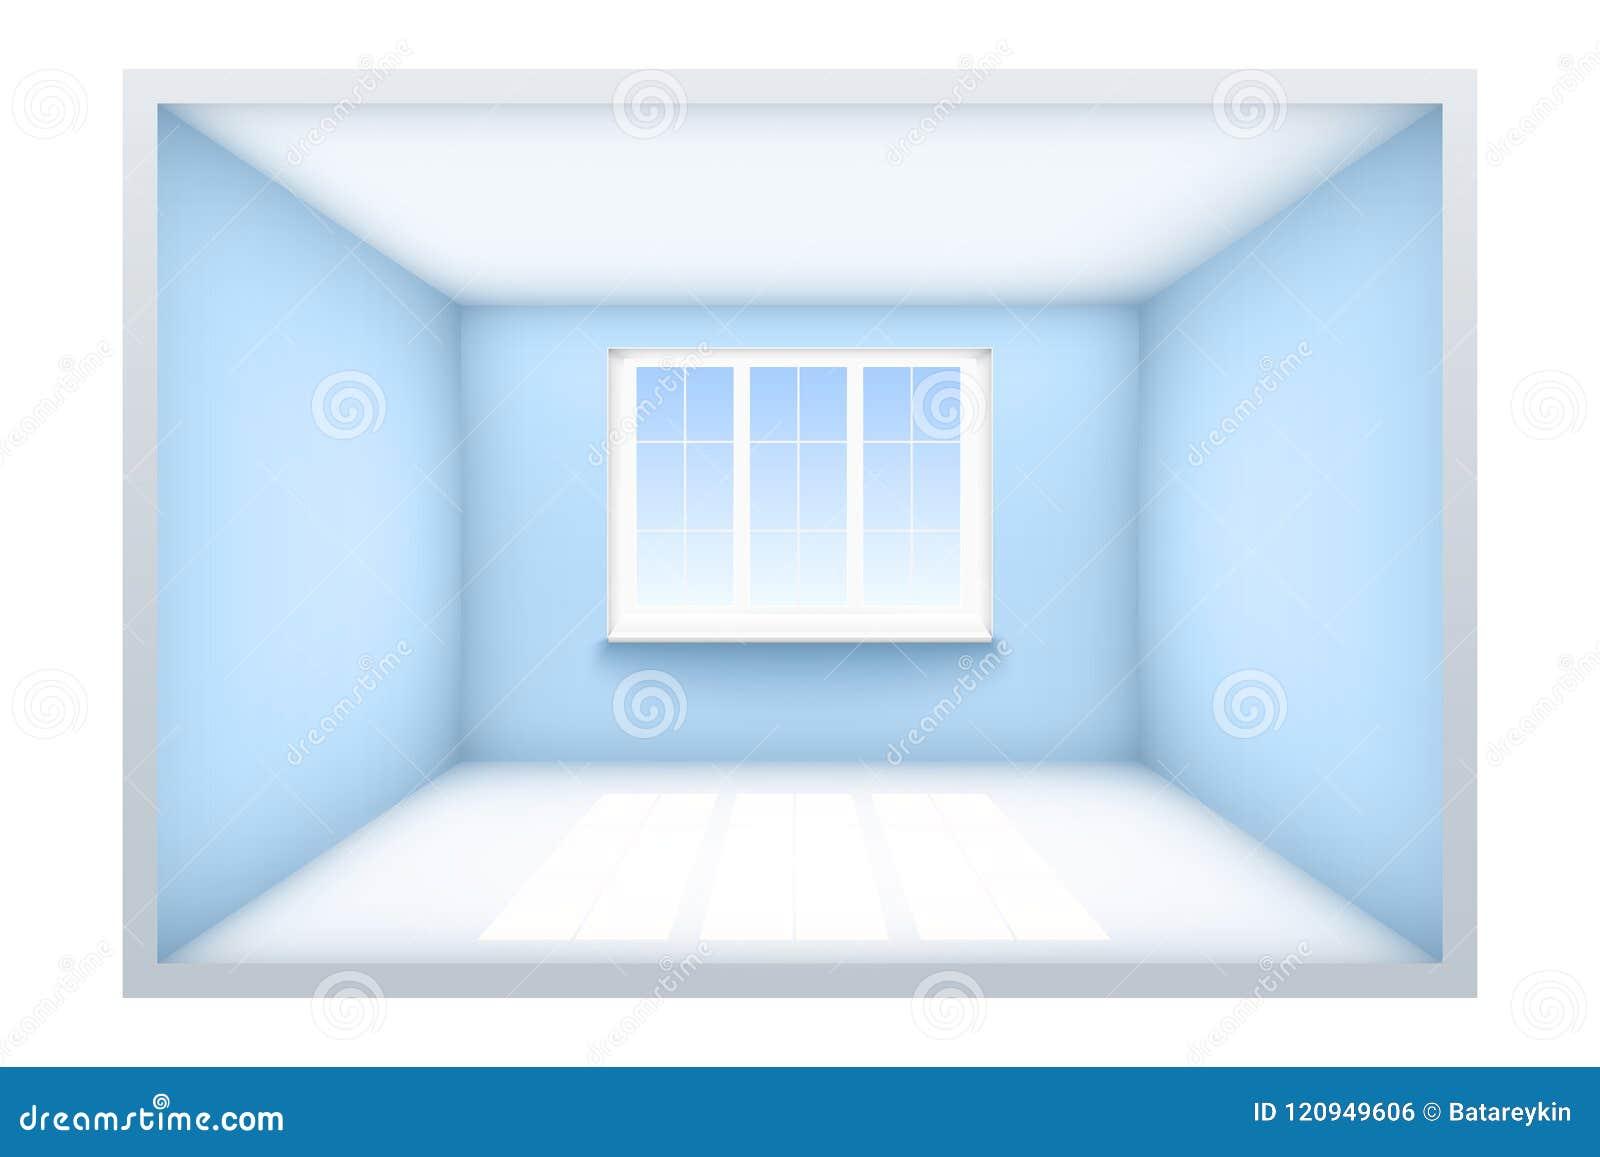 Example of empty room with window.